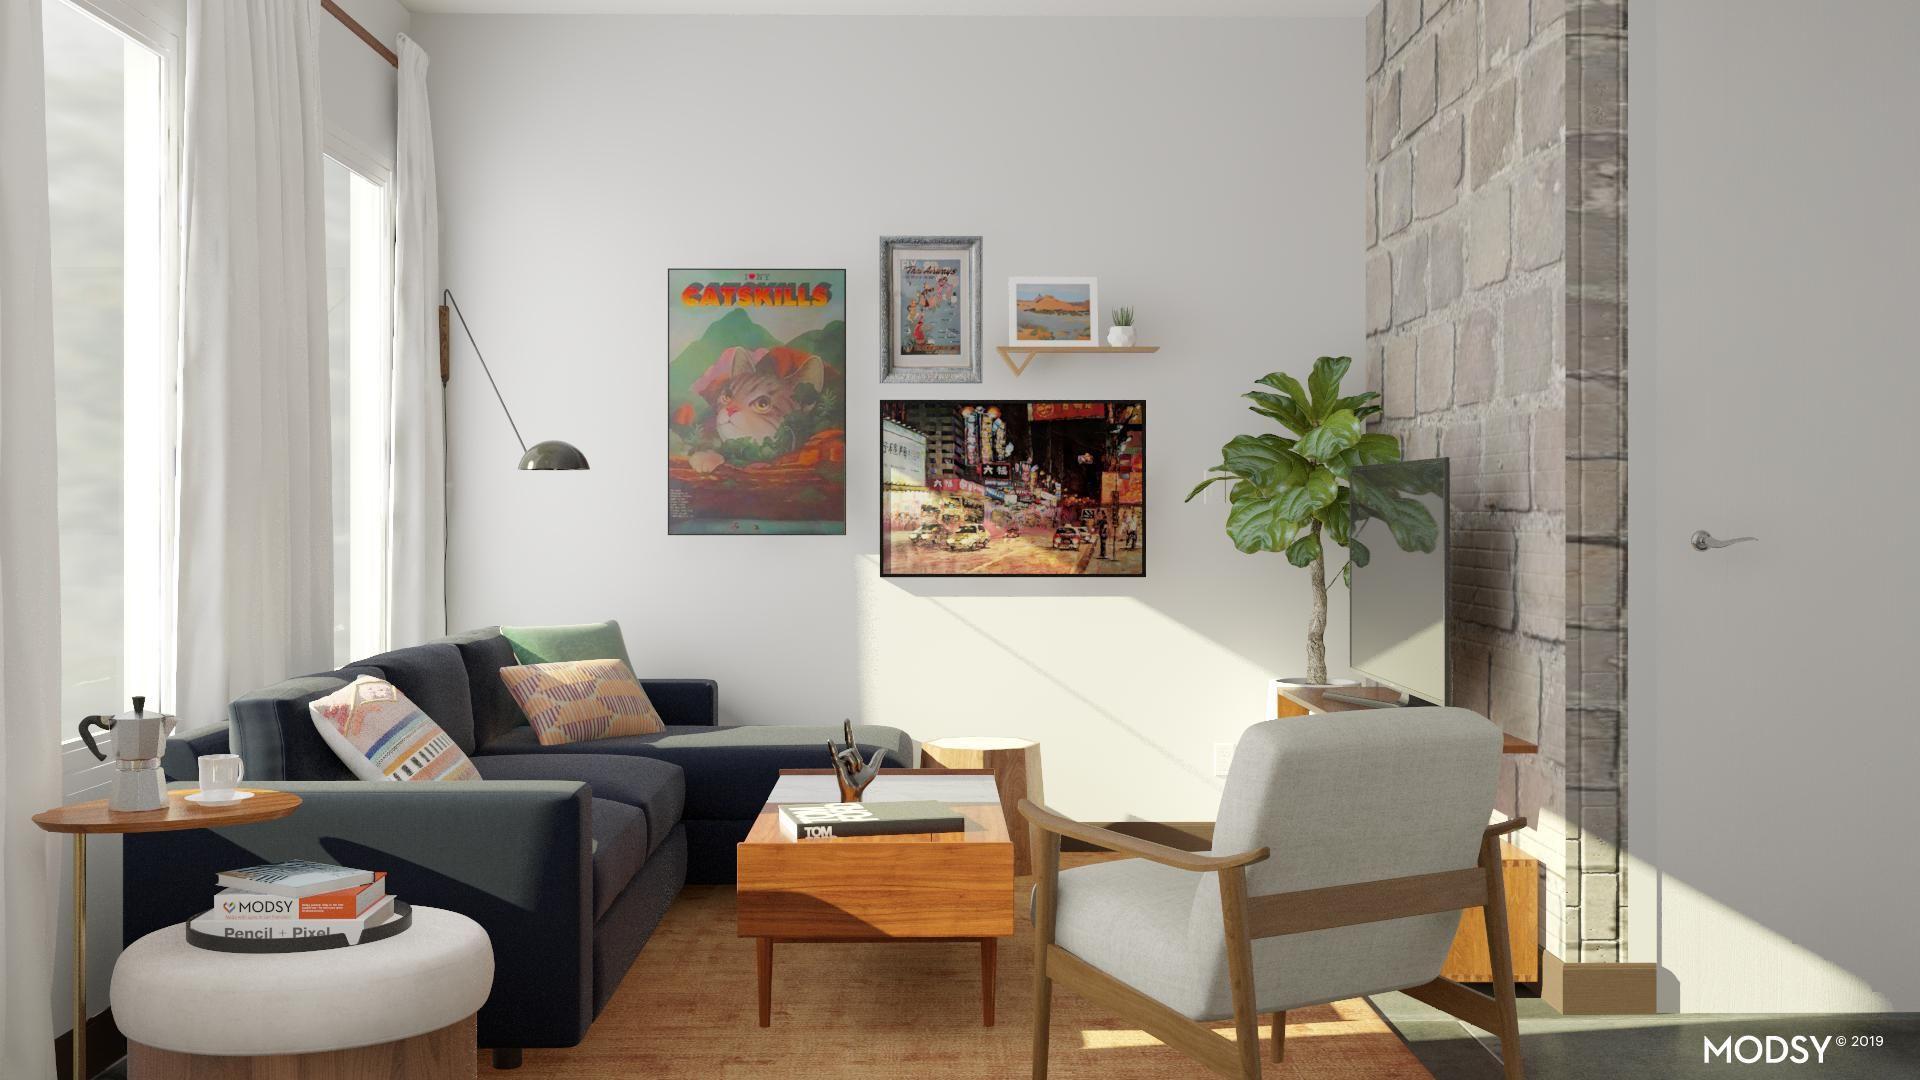 How To Design Your Room Interior Design Modsy Ikea